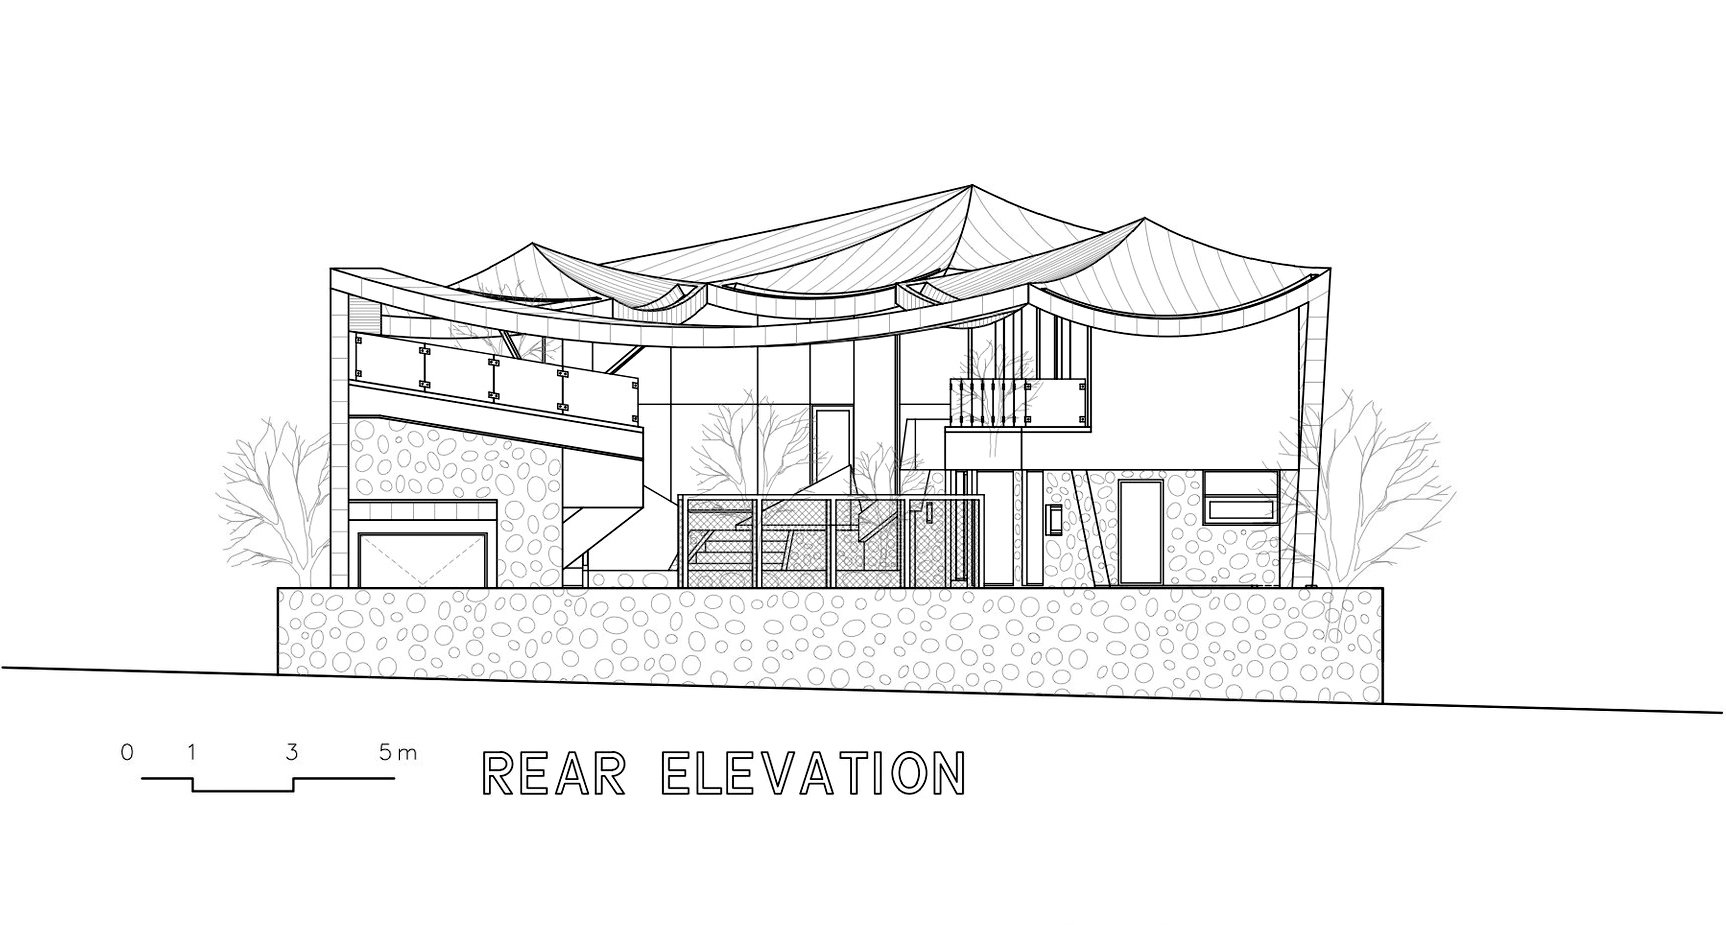 Rear Elevation - Ga On Jai Residence - Seongnam, Gyeonggi, South Korea